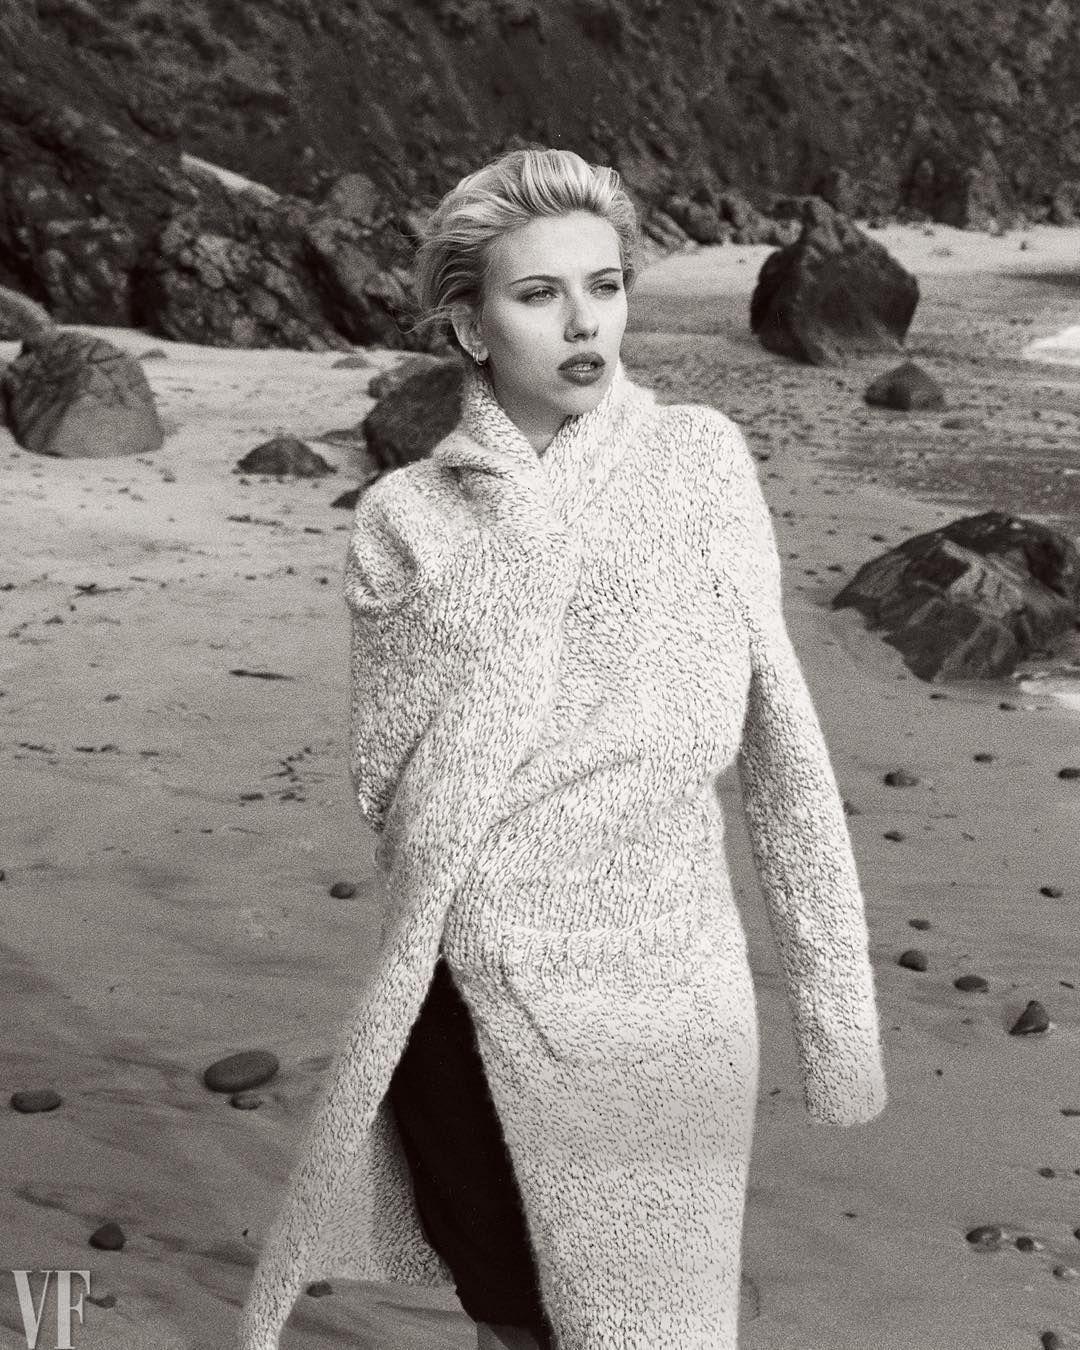 to wear - Johansson scarlett vanity fair march video